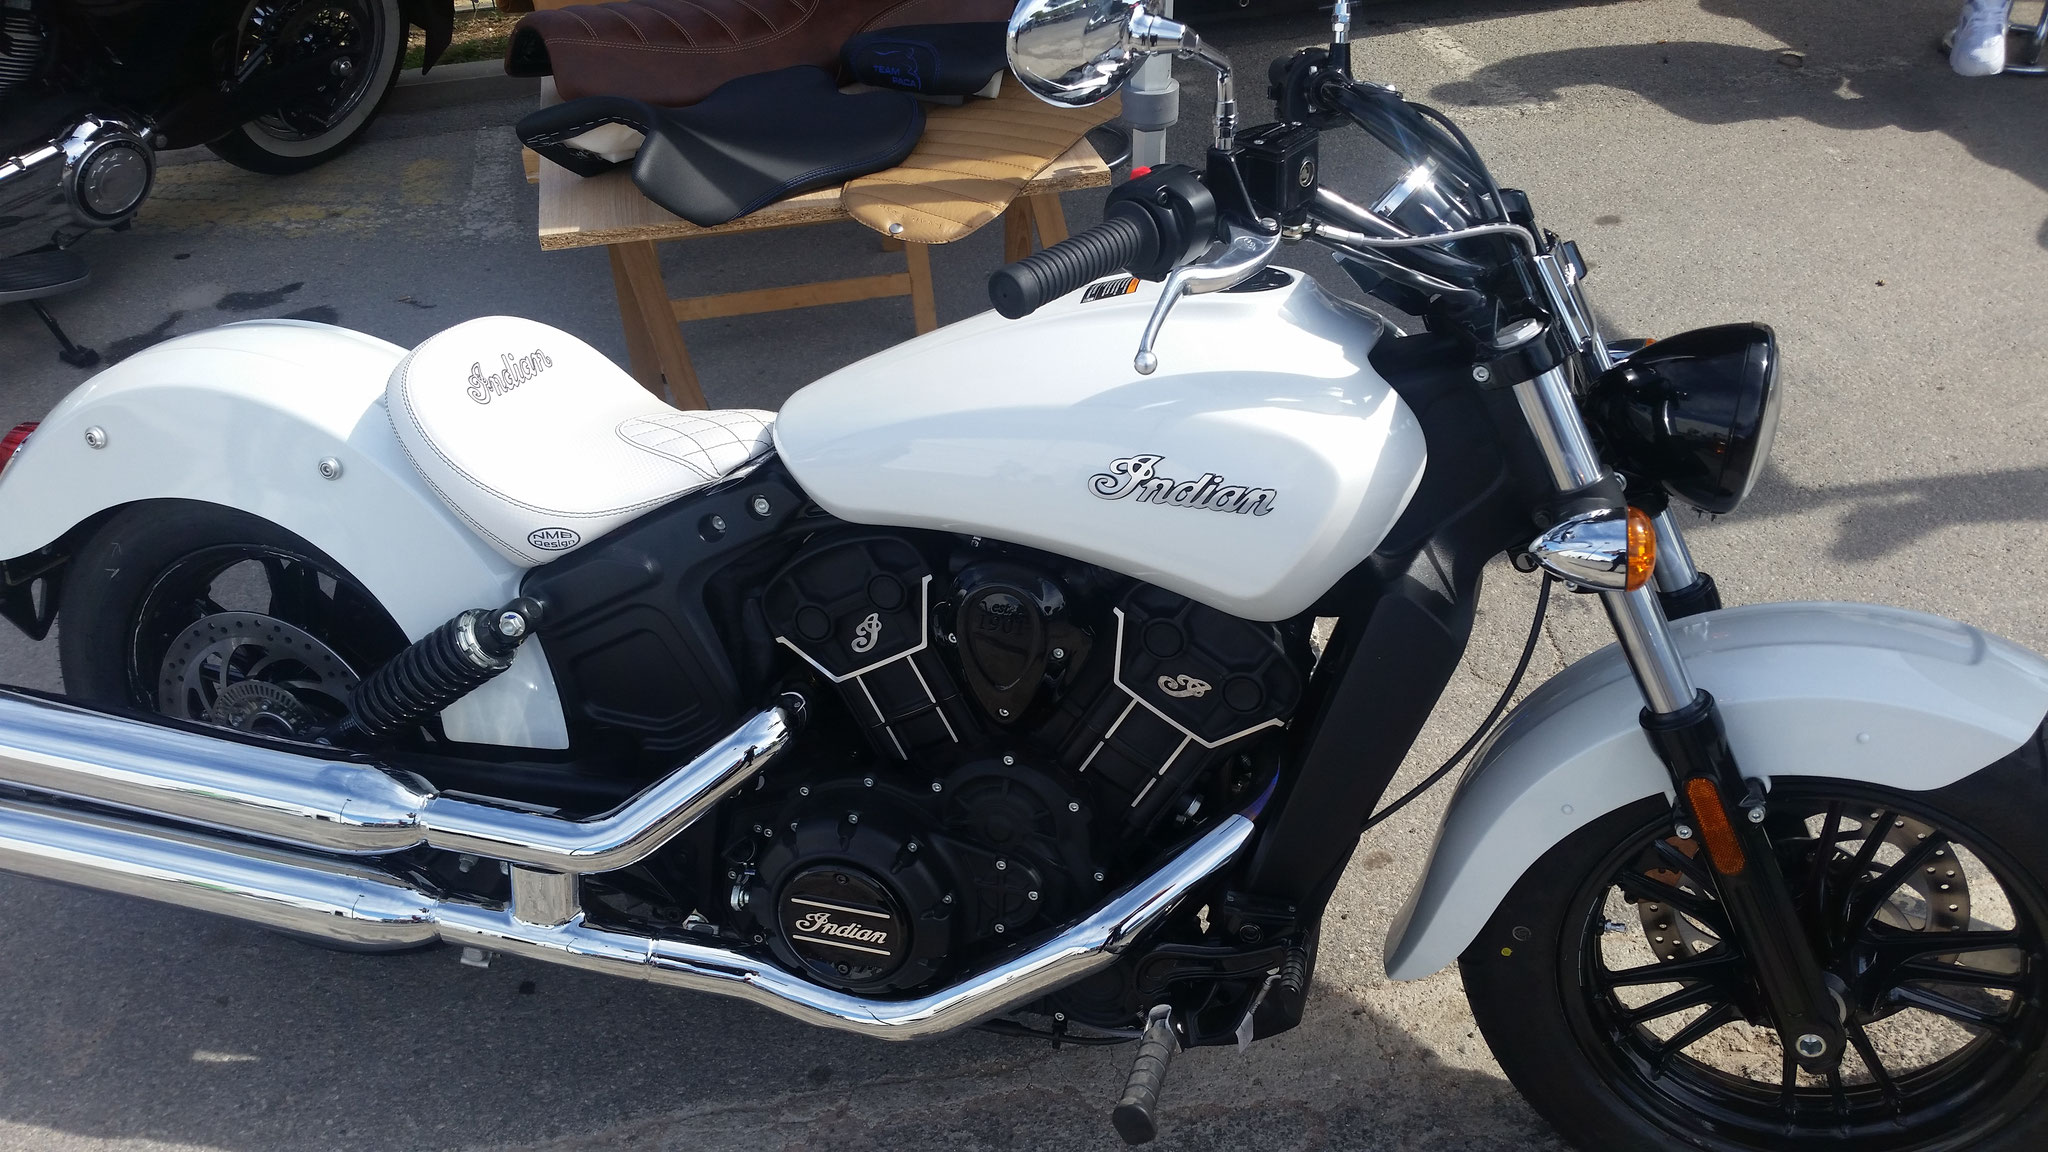 Salon de la moto de cagnes sur mer 2016 nmb design - Salon moto cagnes sur mer ...